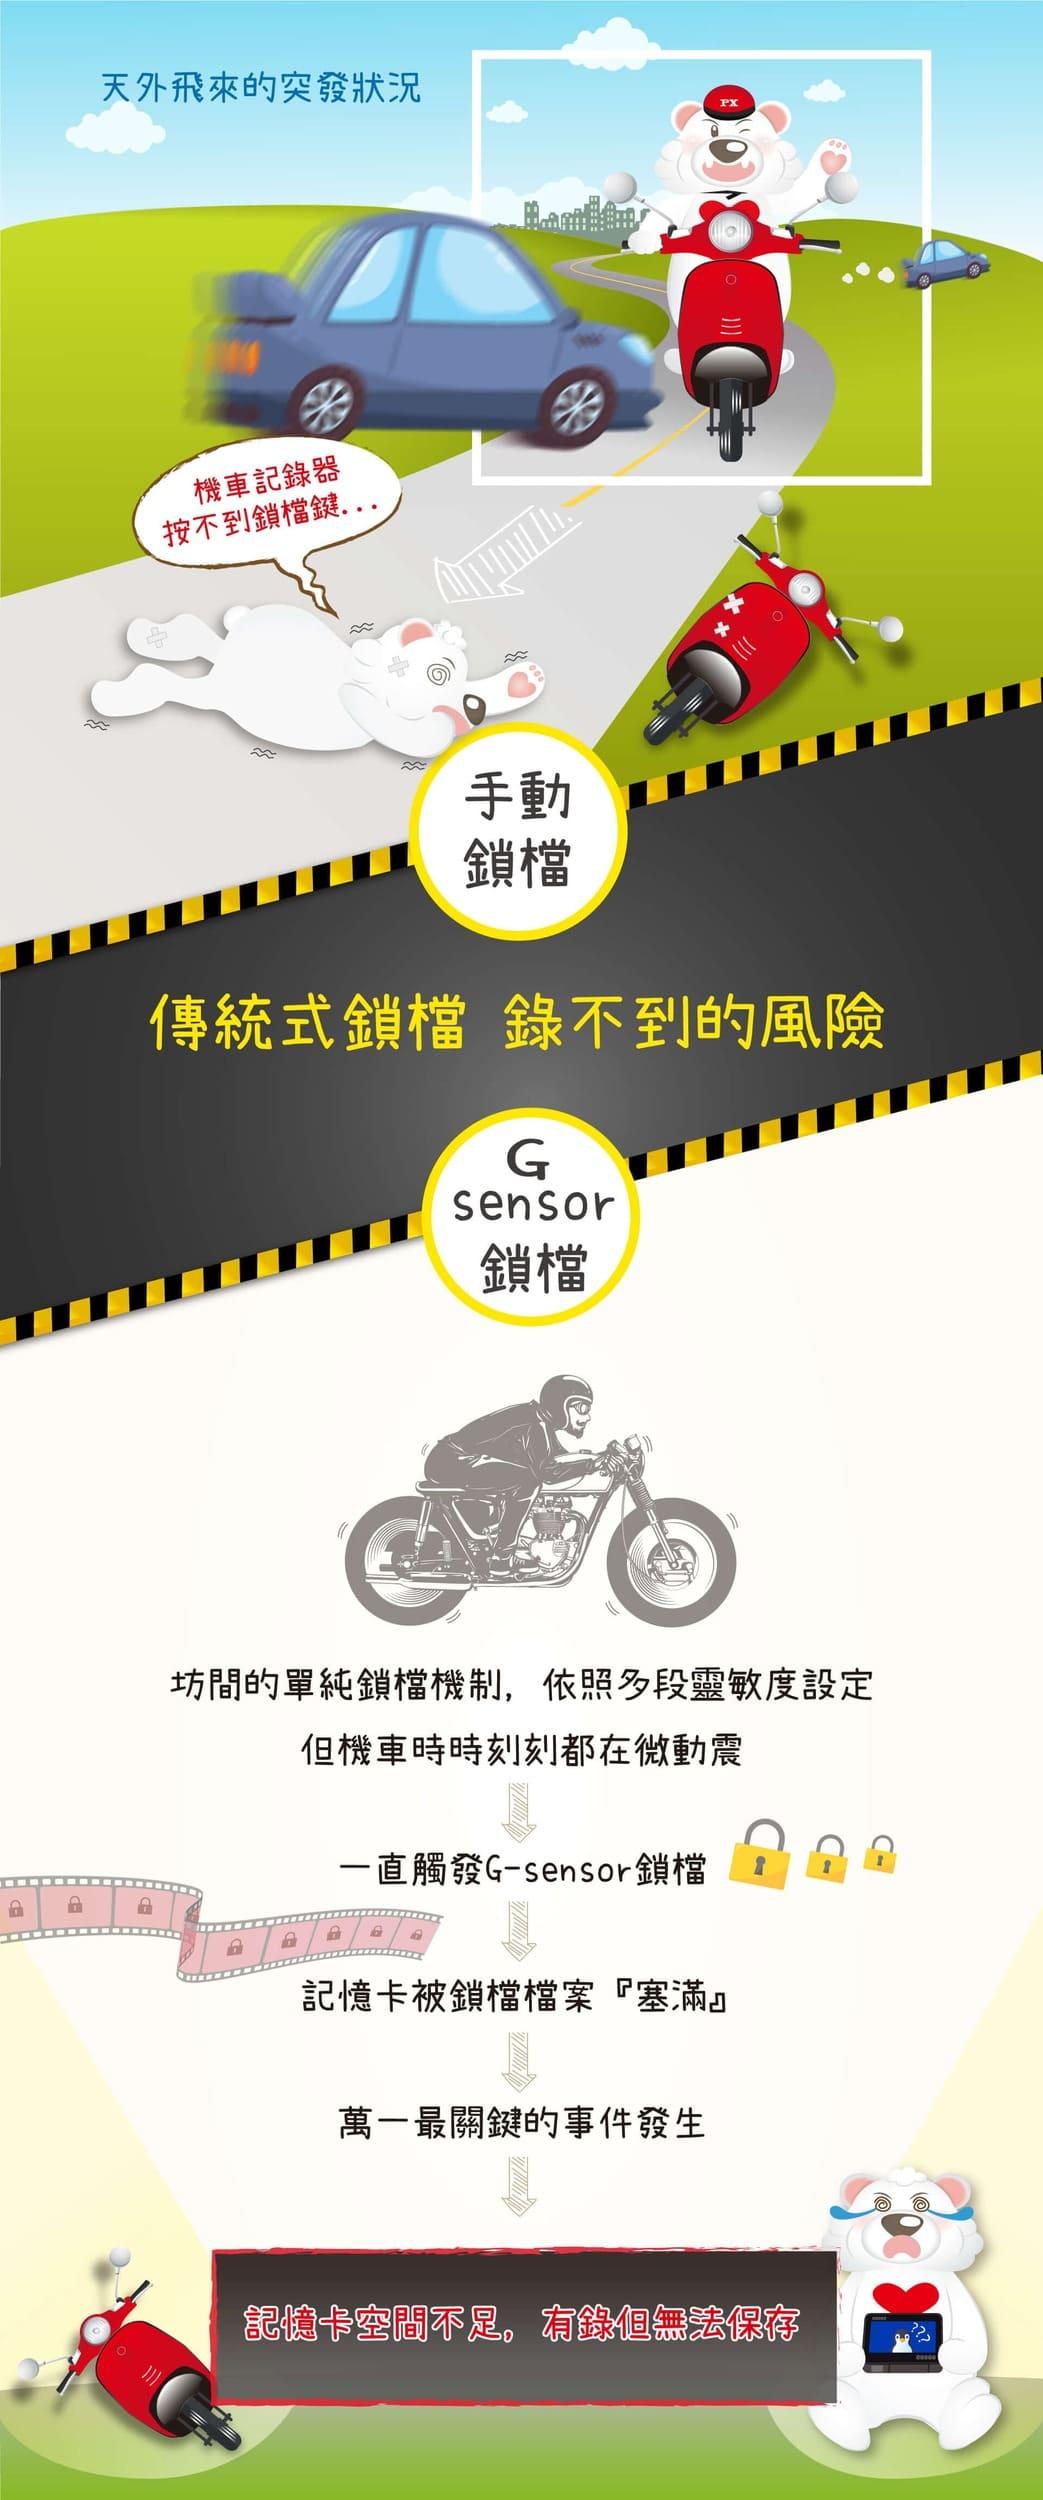 proimages/PX_School/BikeCam/002-機車記錄器車倒鎖檔/02.jpg